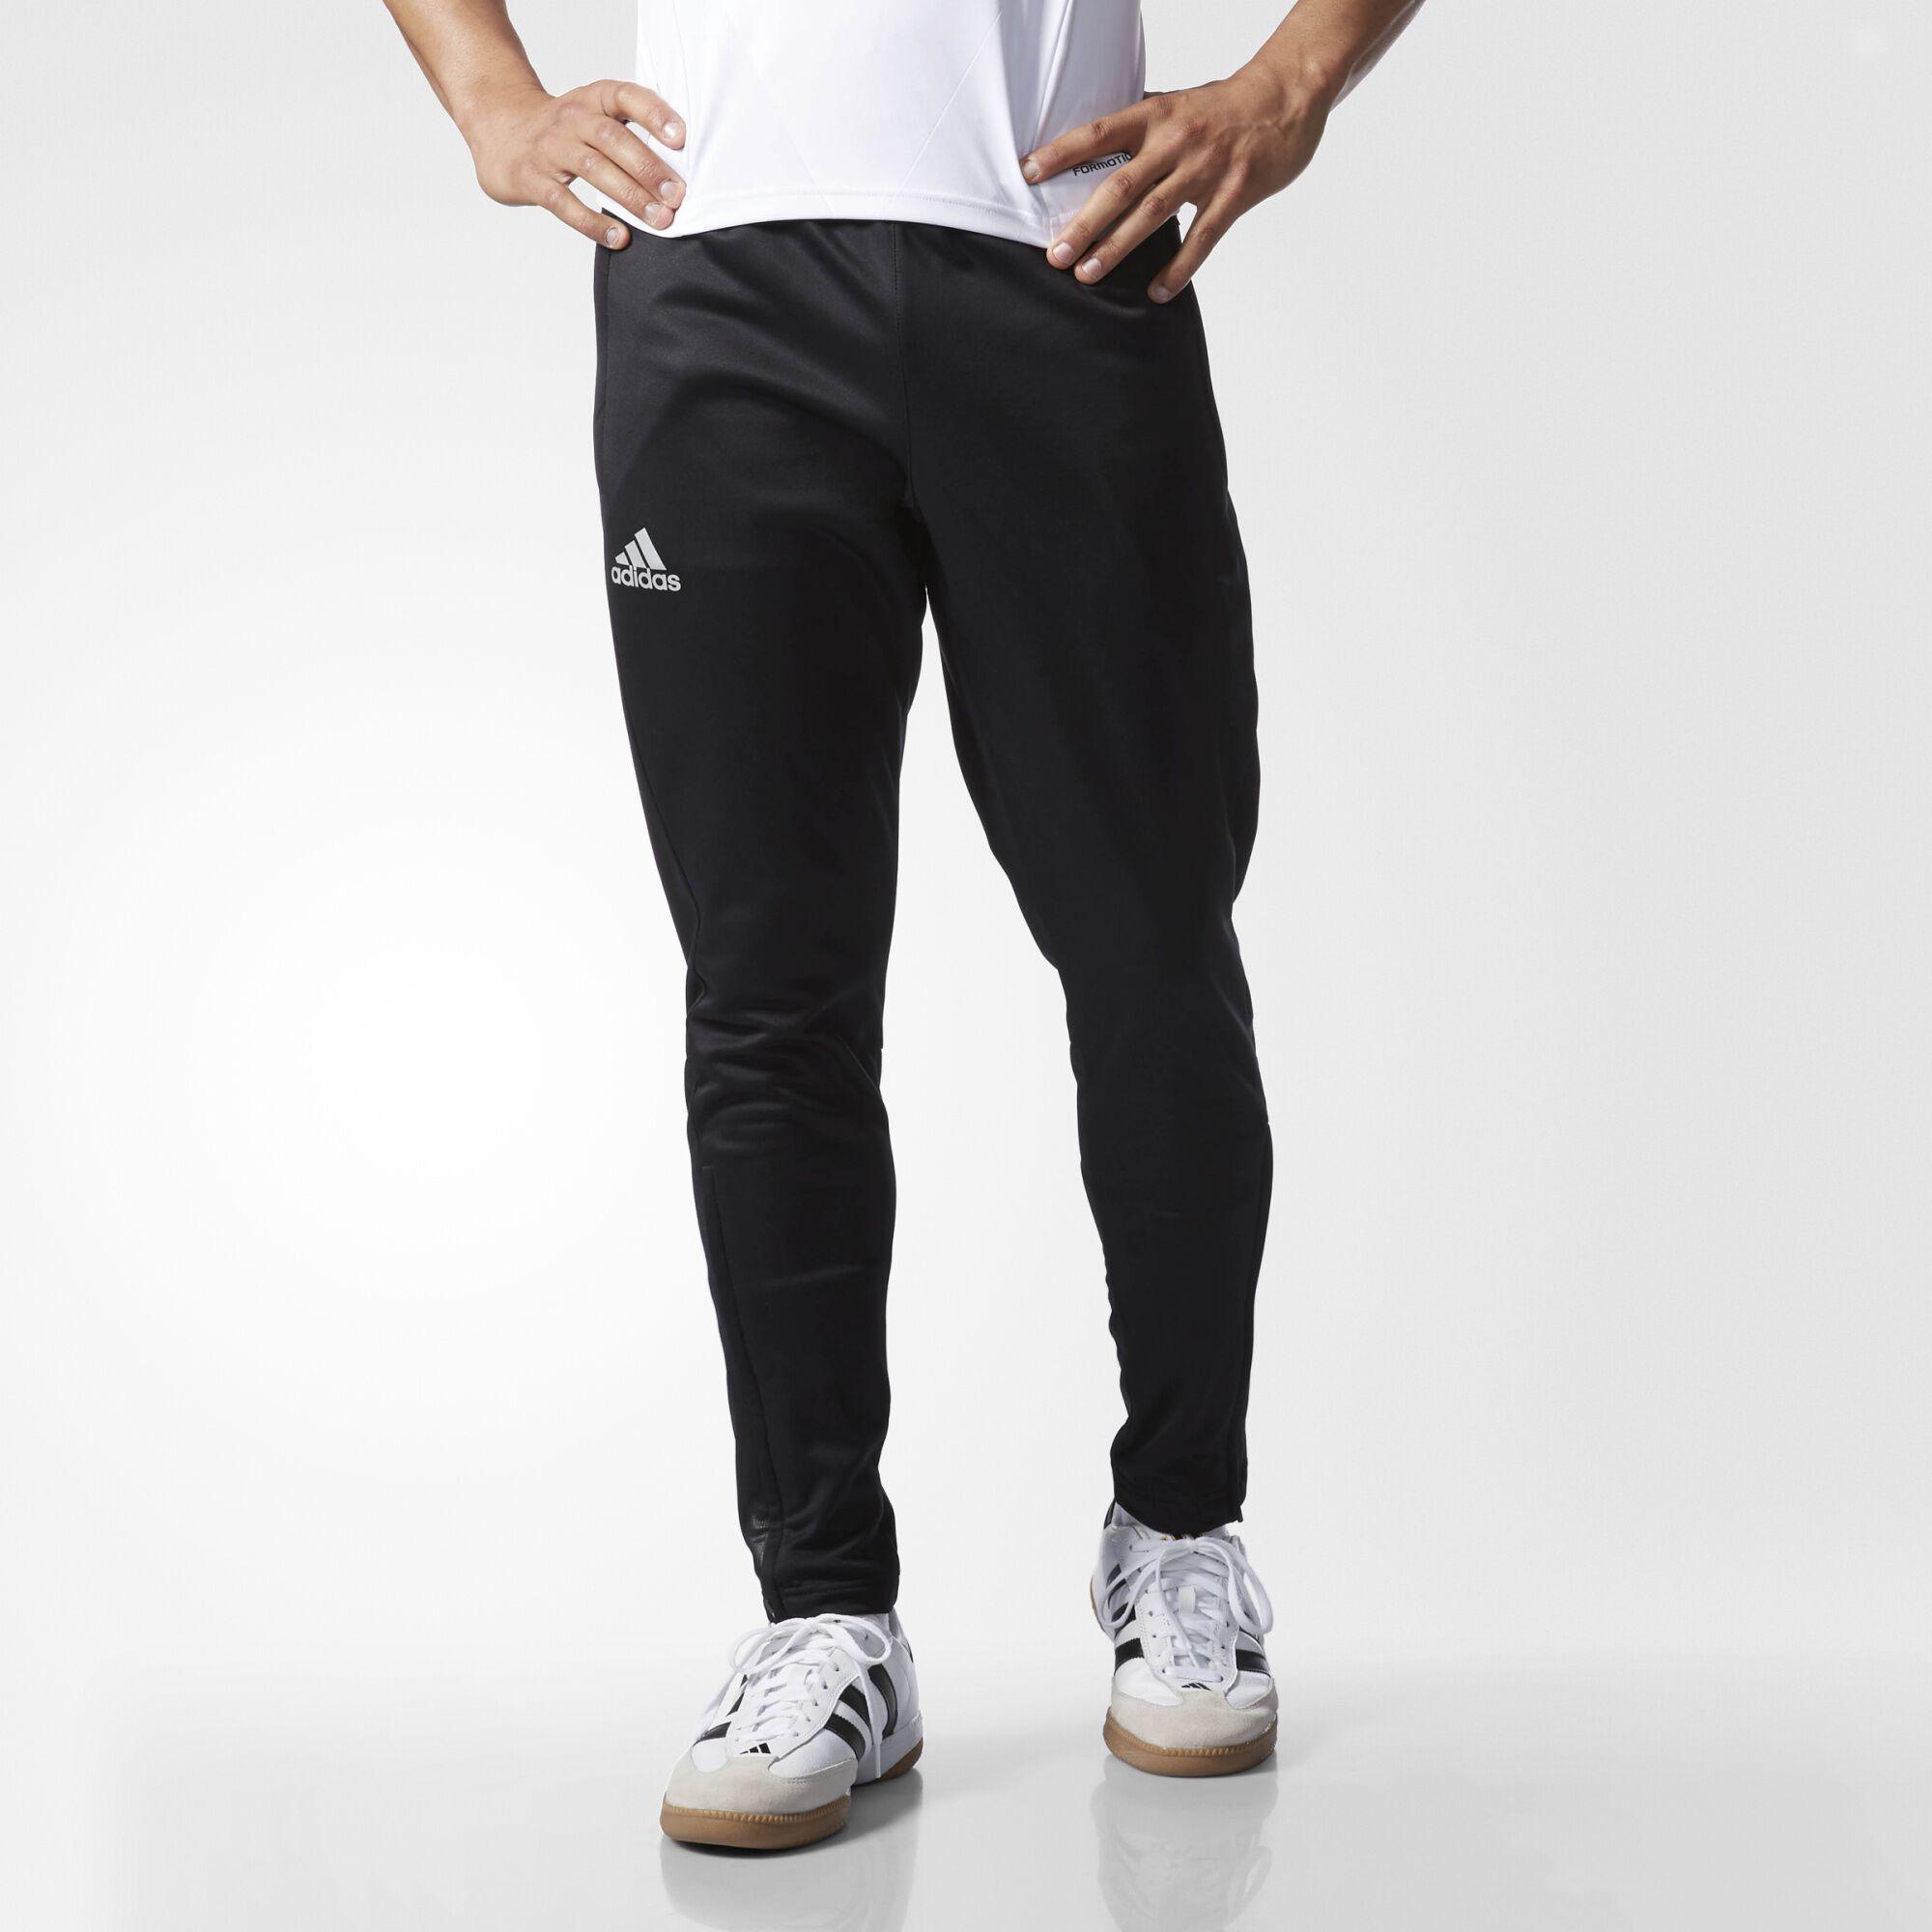 adidas messi soccer pants black adidas us